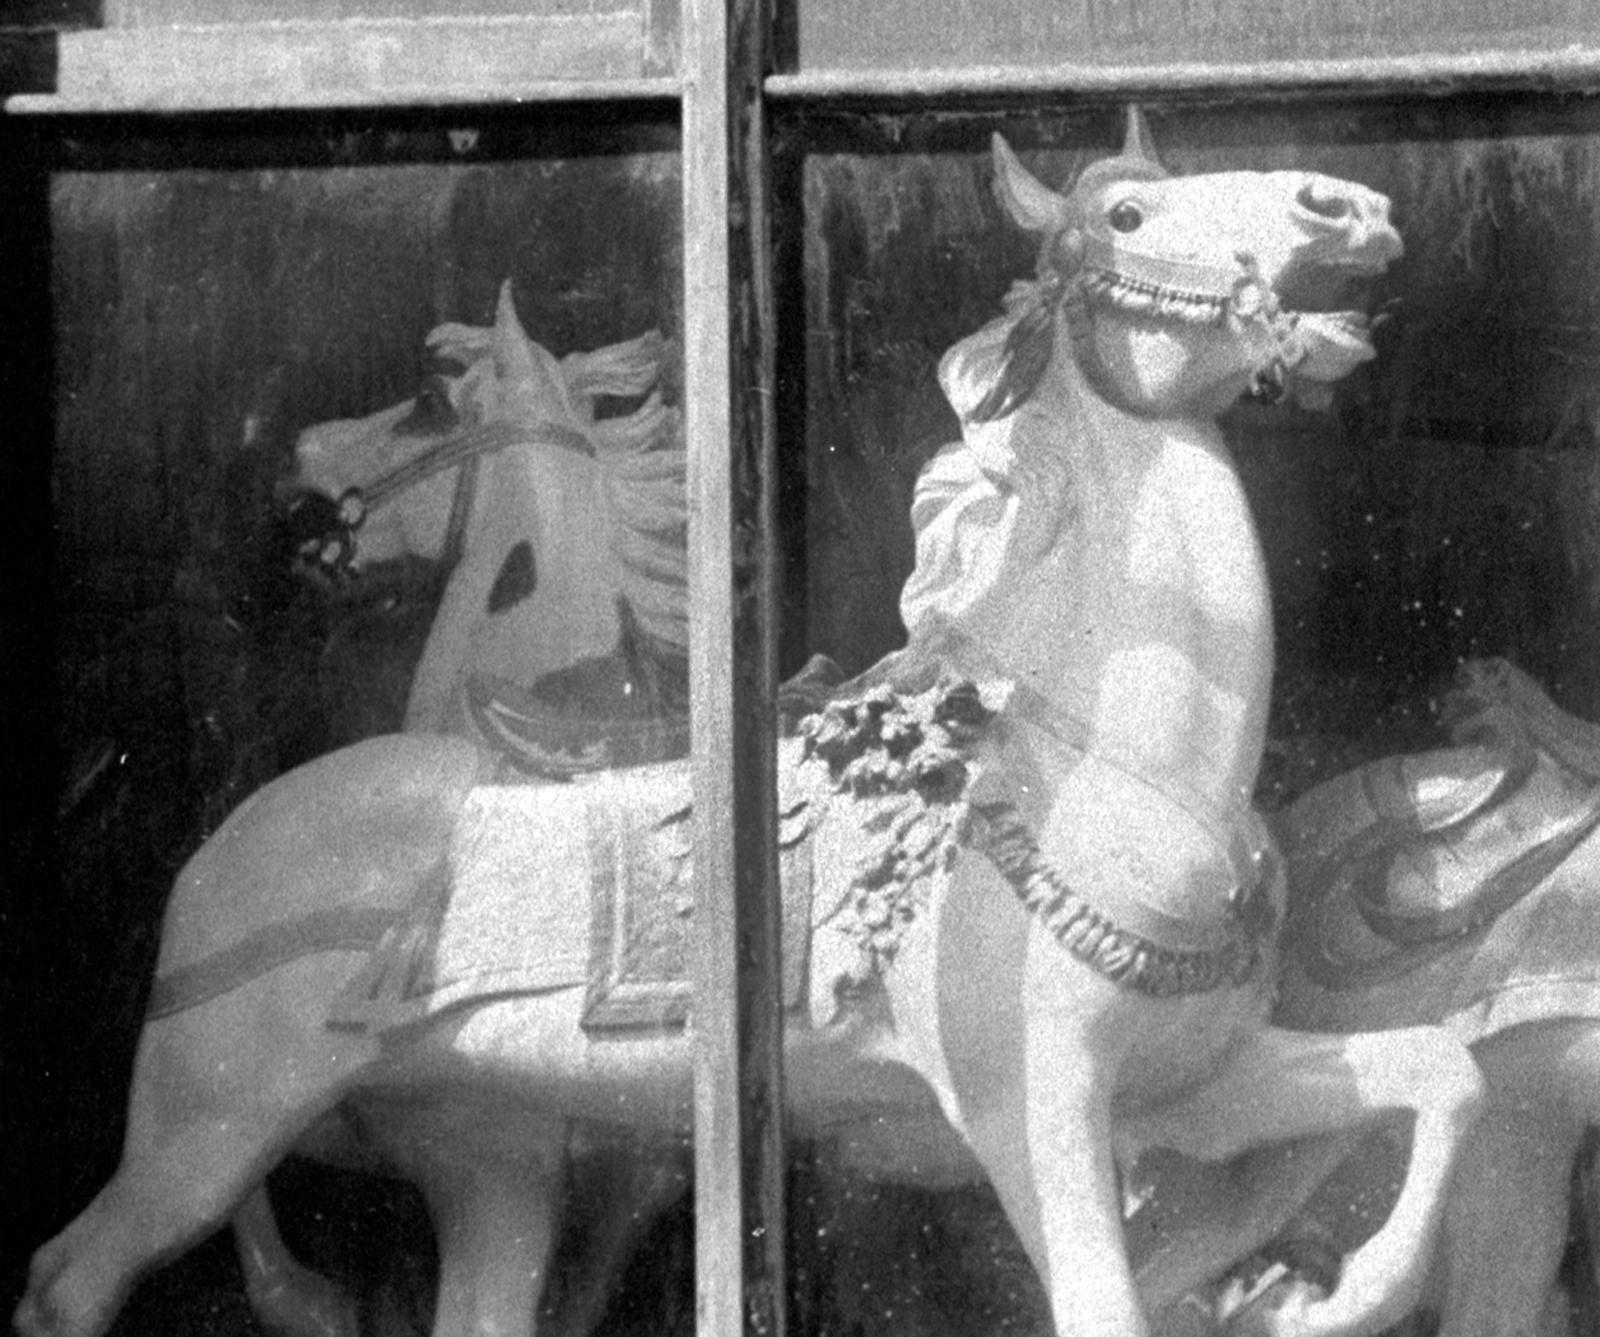 D-C-Muller-shop-window-close-left-ca-1910